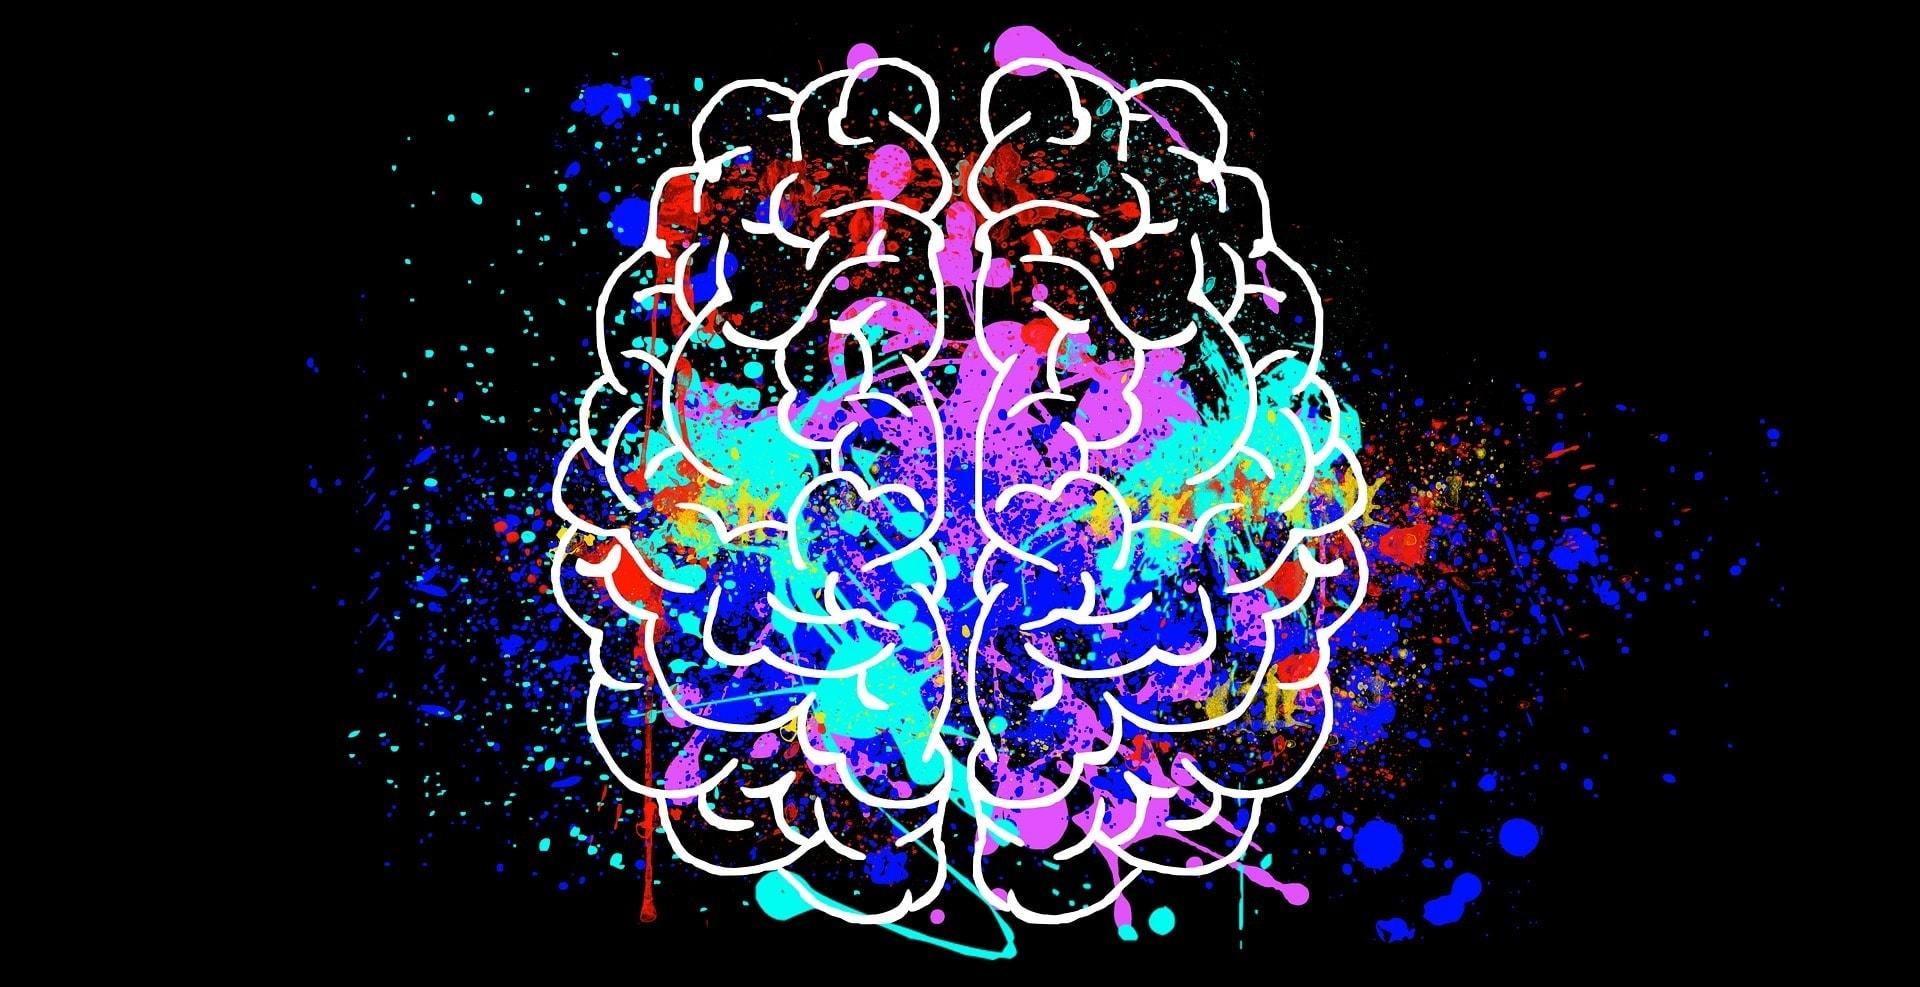 caos brain